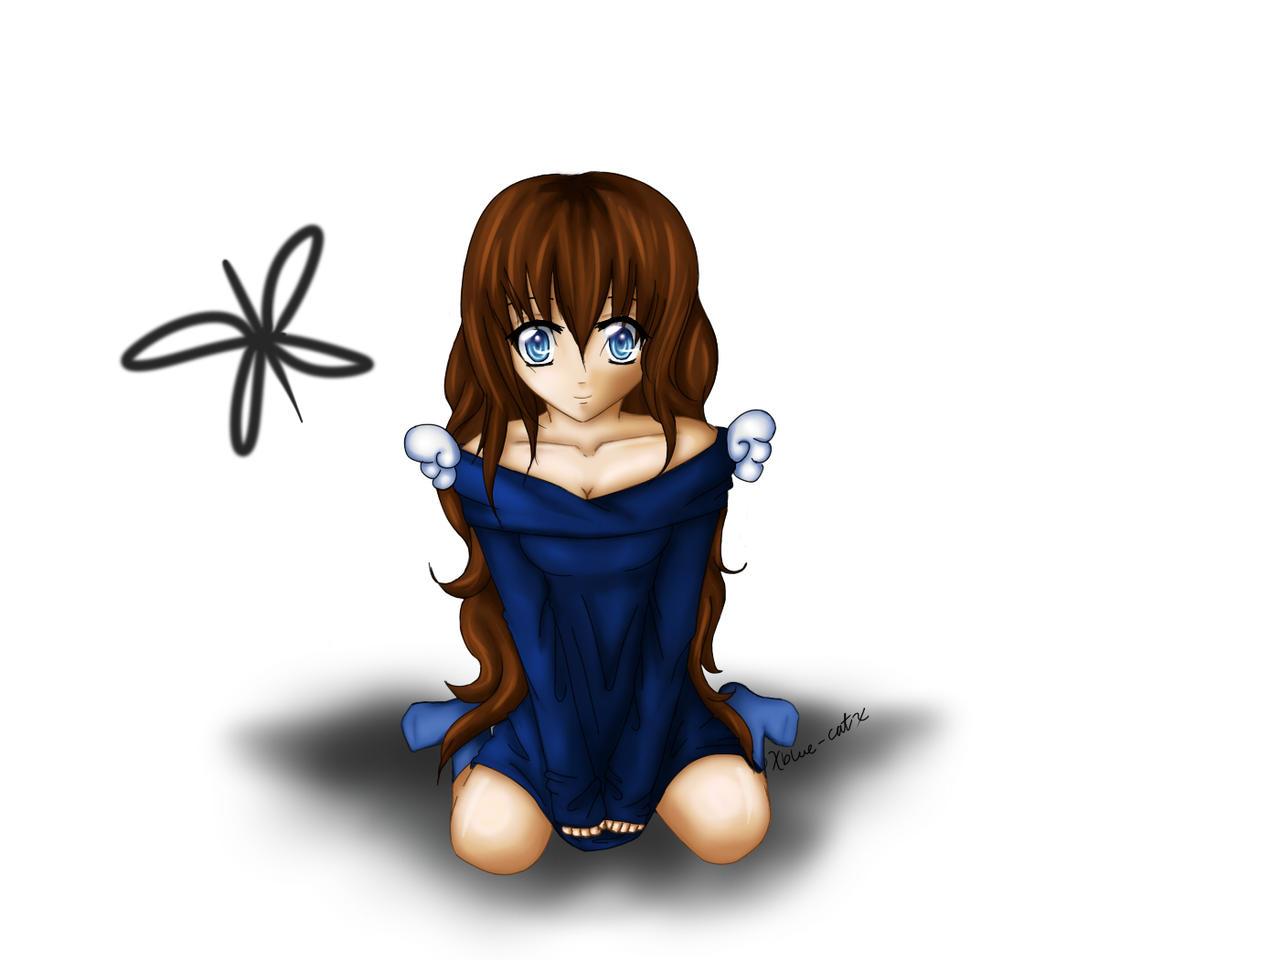 Anime Girl by xblue-catx